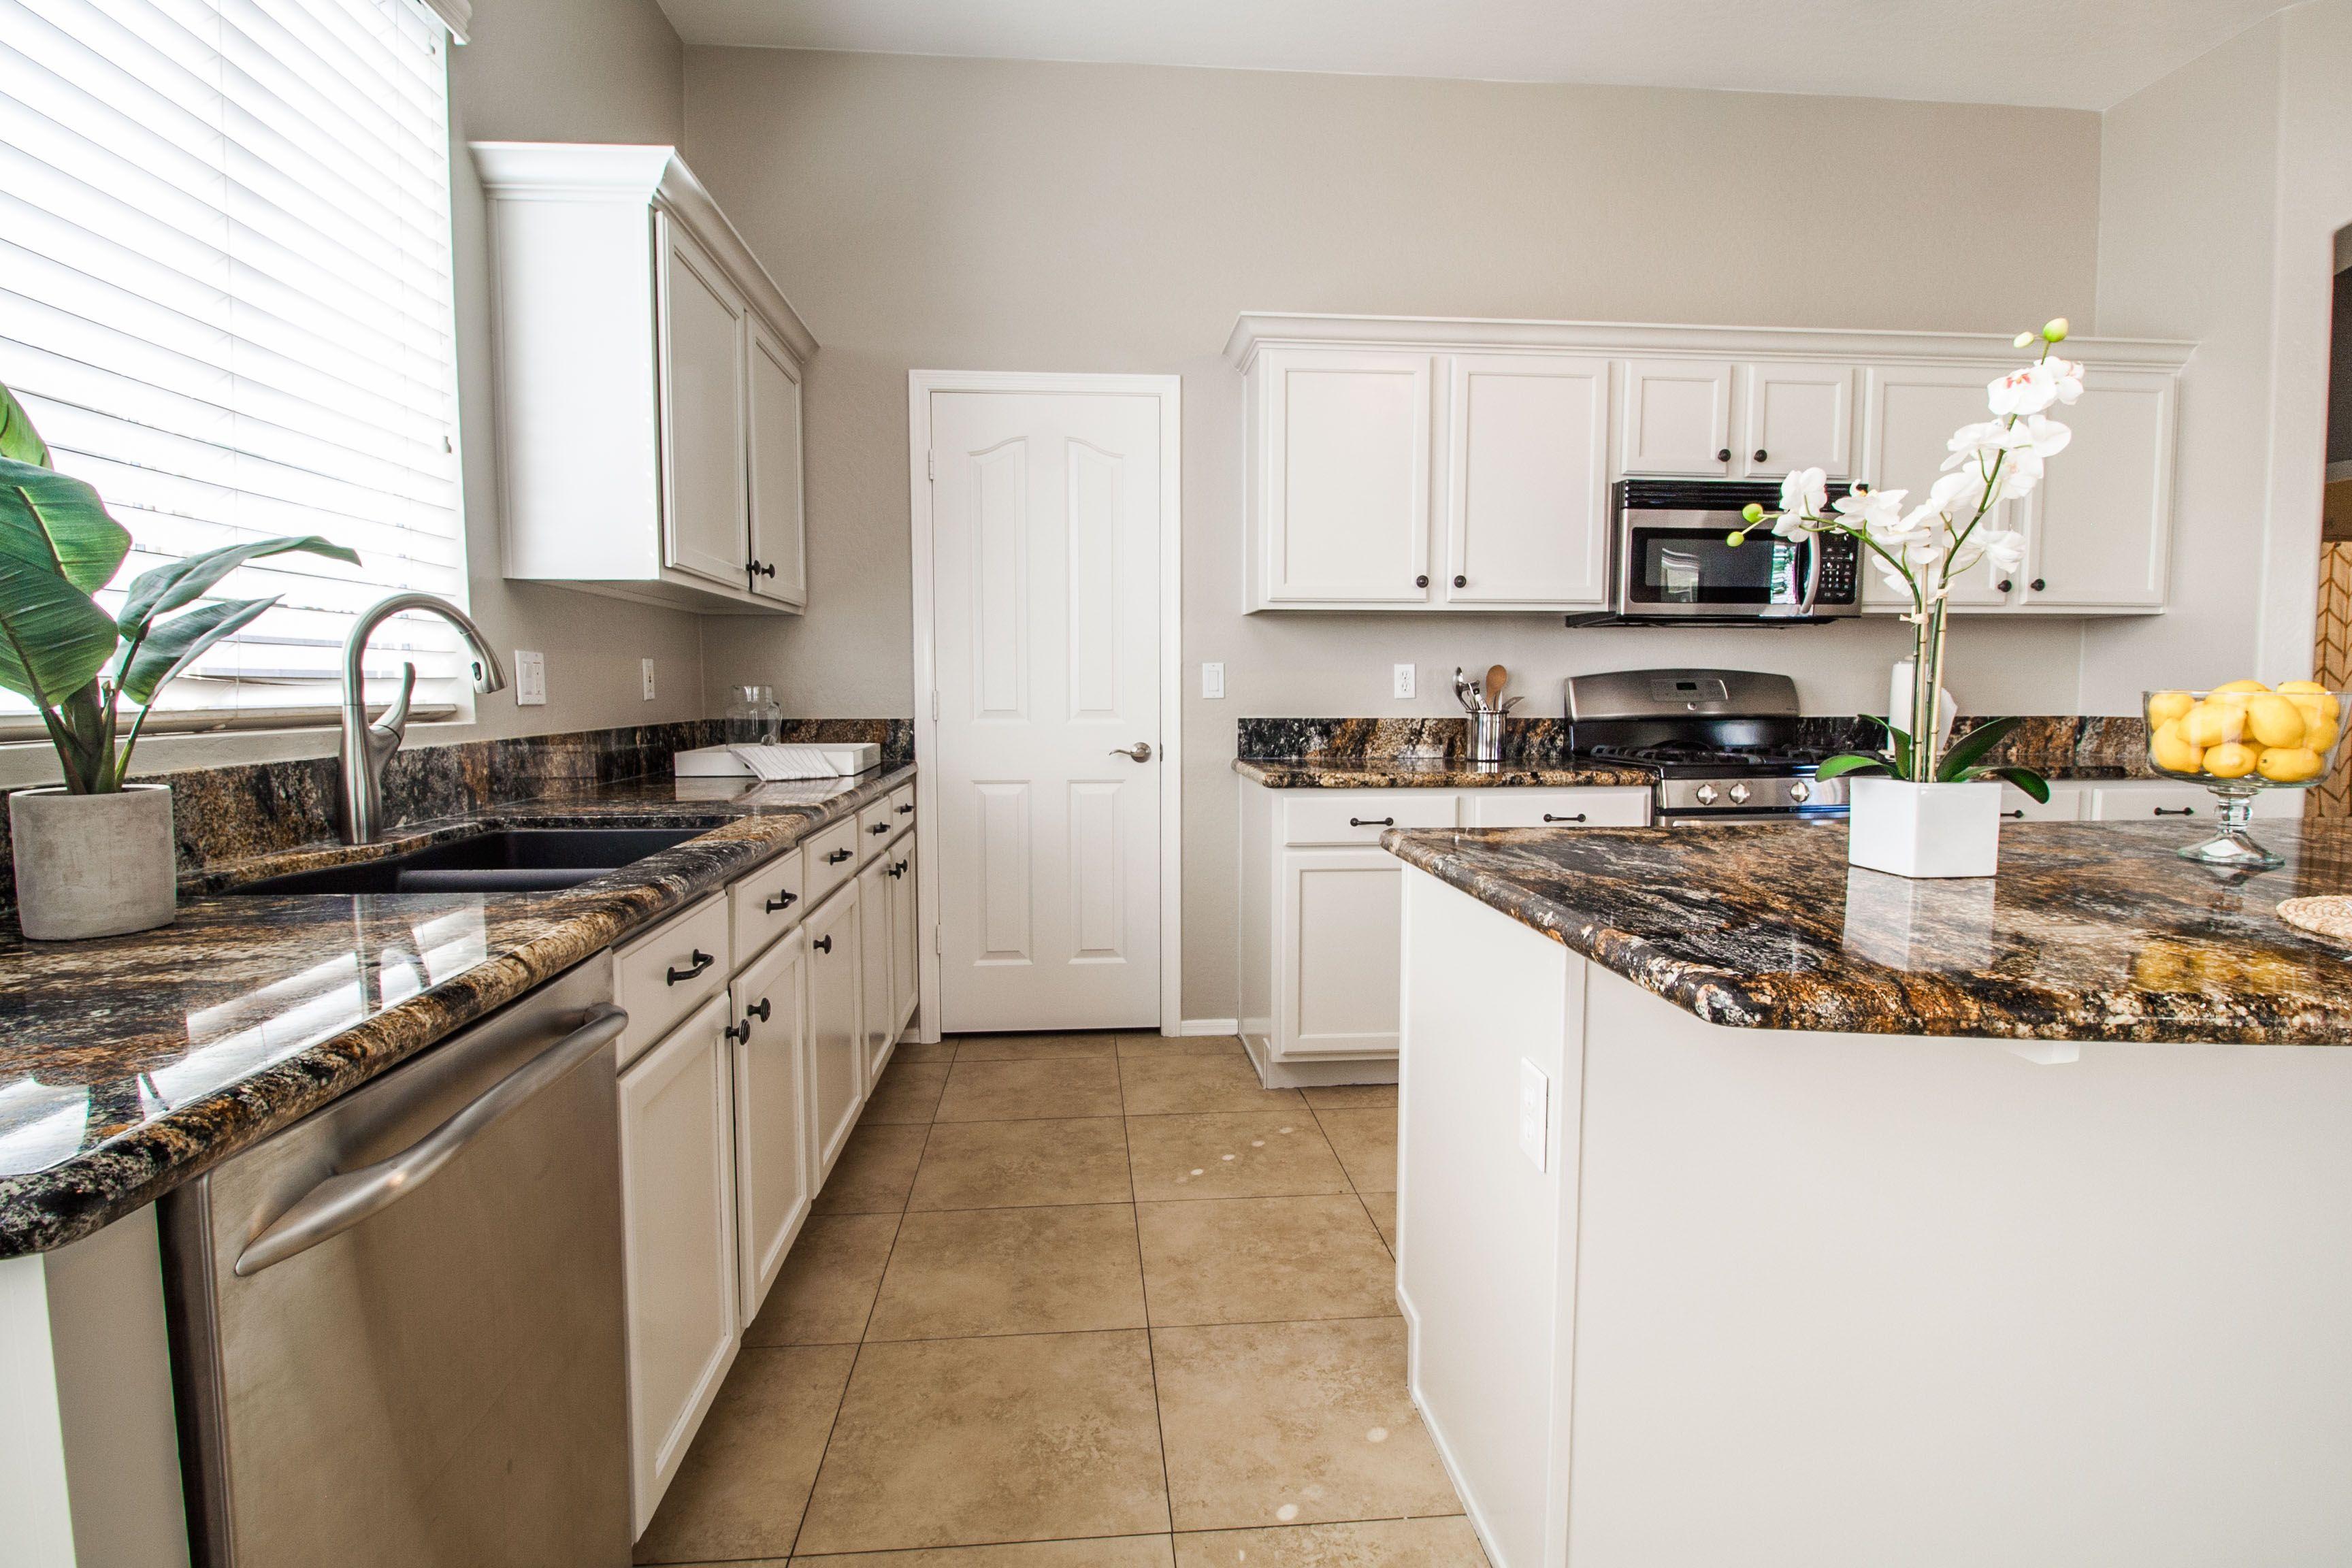 Pin By Royce Munroe On 1772 E Flintlock Way Chandler Az Kitchen Cabinets Kitchen Home Decor